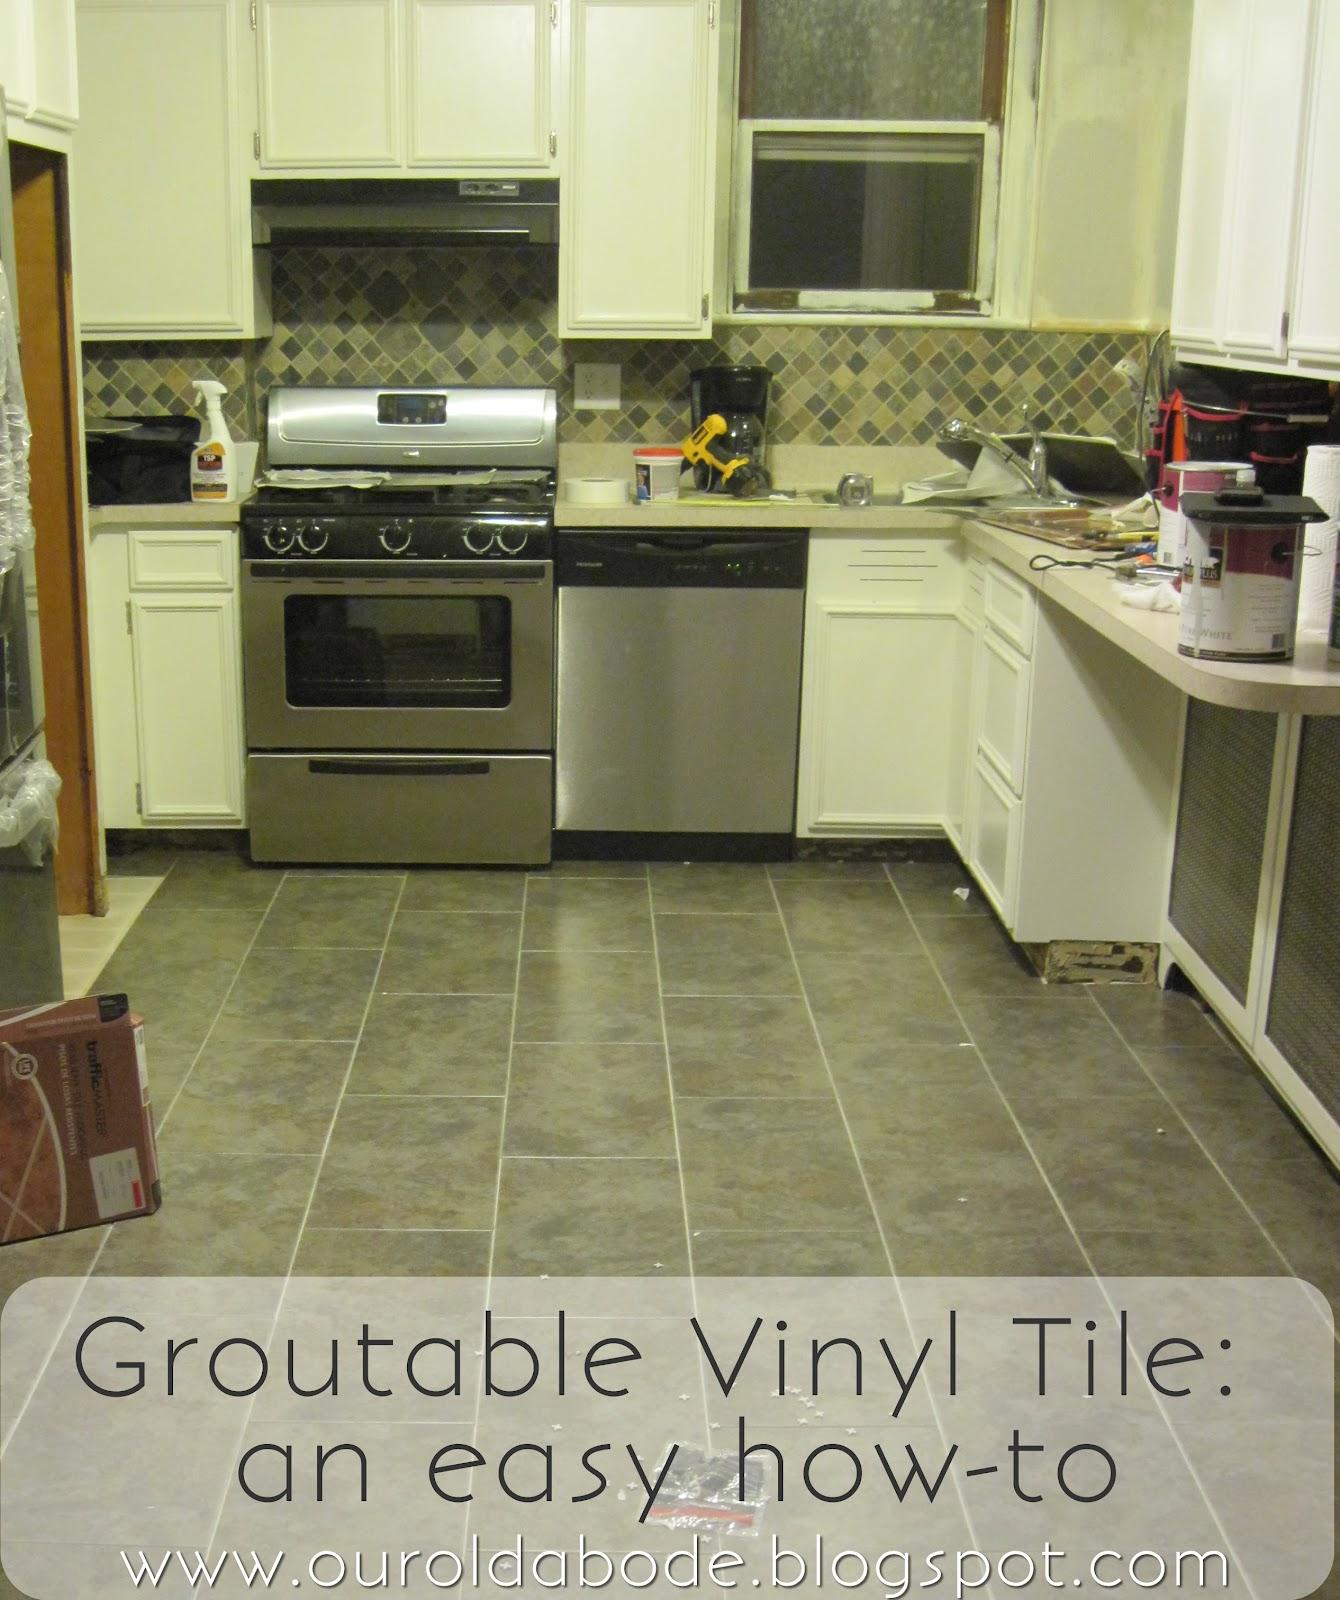 Kitchen Vinyl Antique Brass Hardware Our Old Abode Floor Groutable Tile